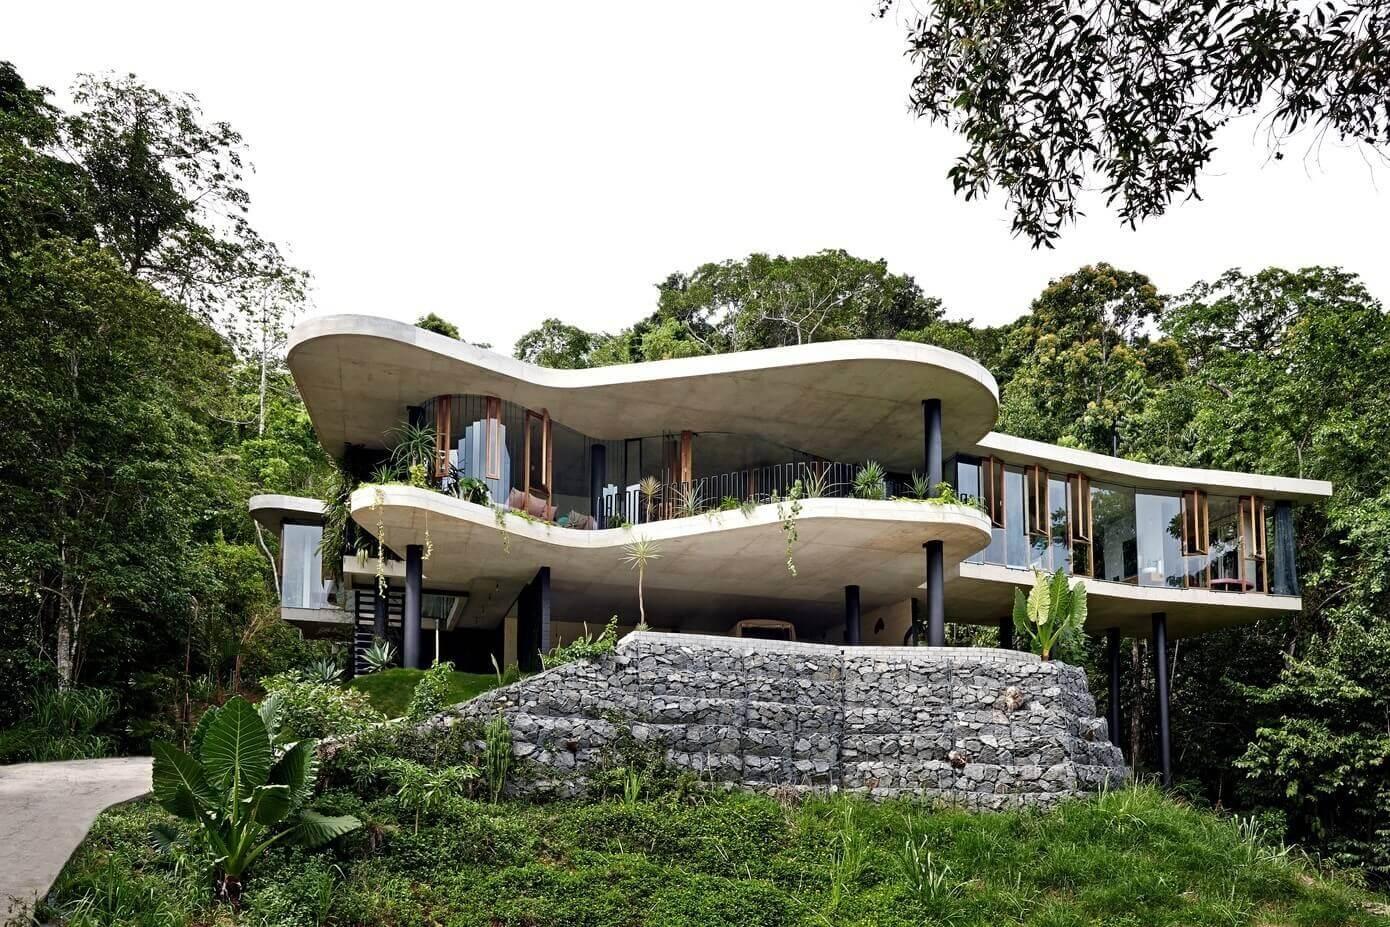 planchonella-house-jesse-bennett-architect-01